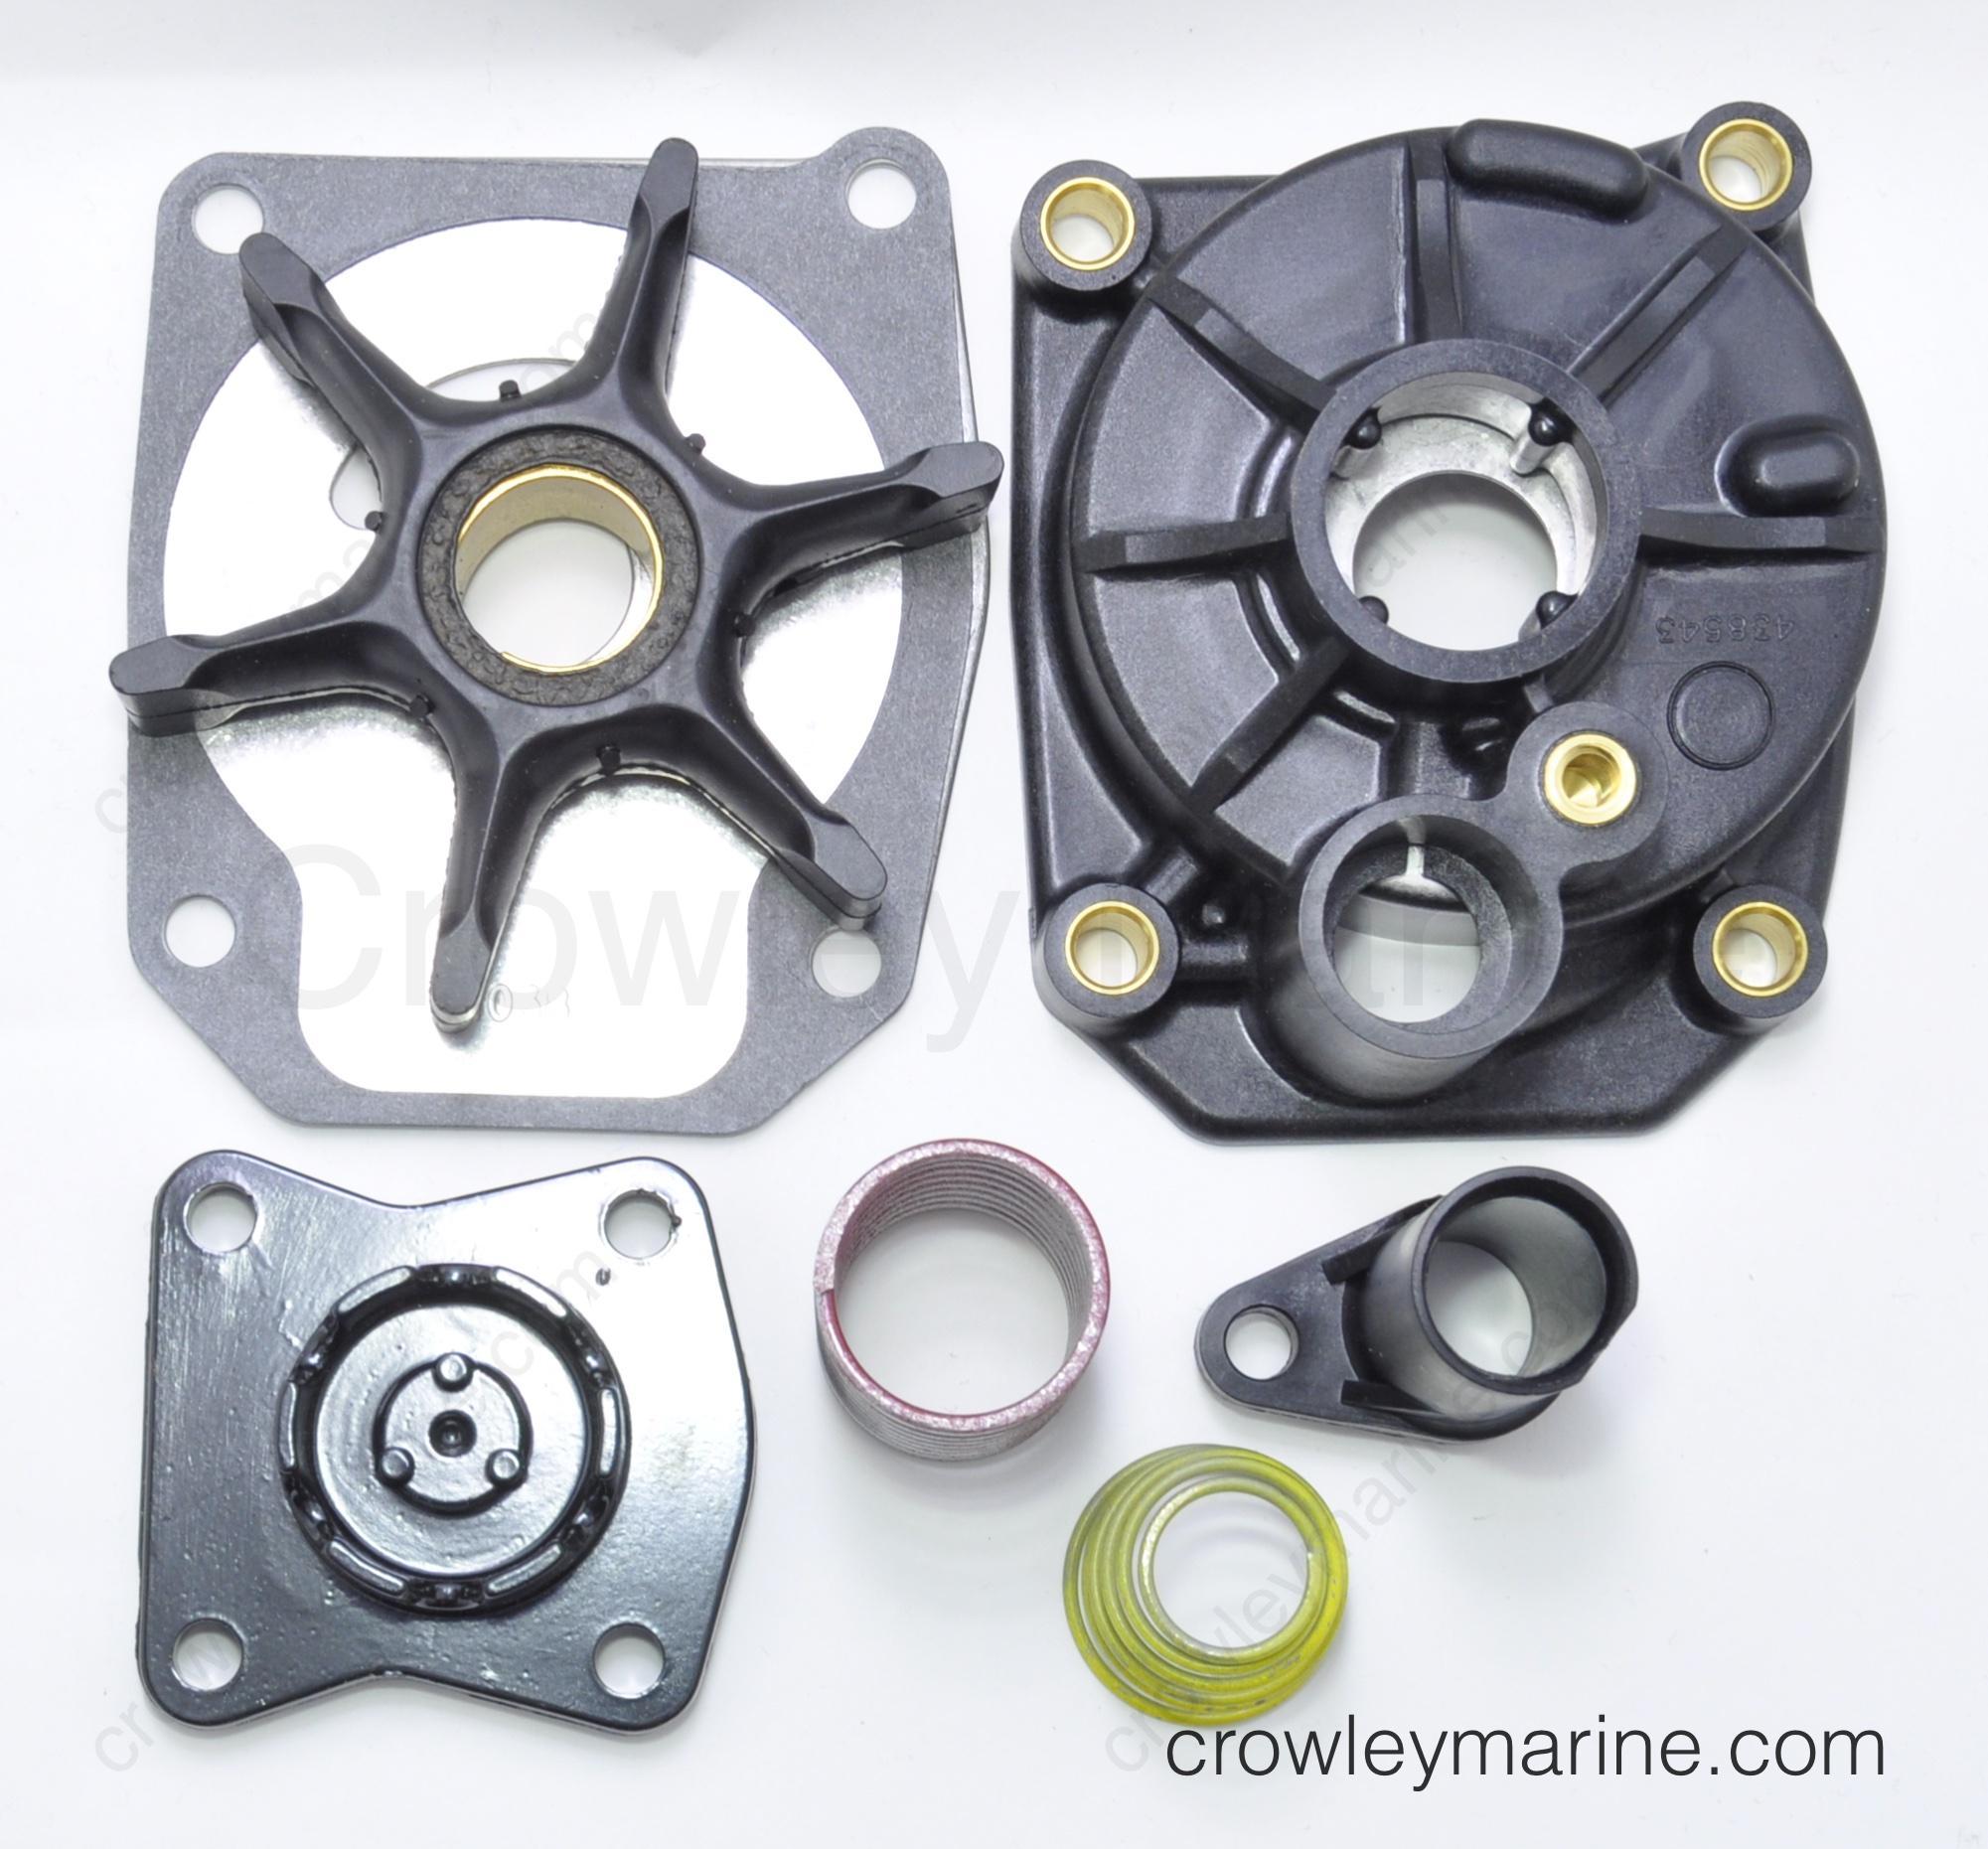 700-255 Johnson 0437059 Evinrude 25-70 Hp Wedge Type Impeller  OEM 0432941